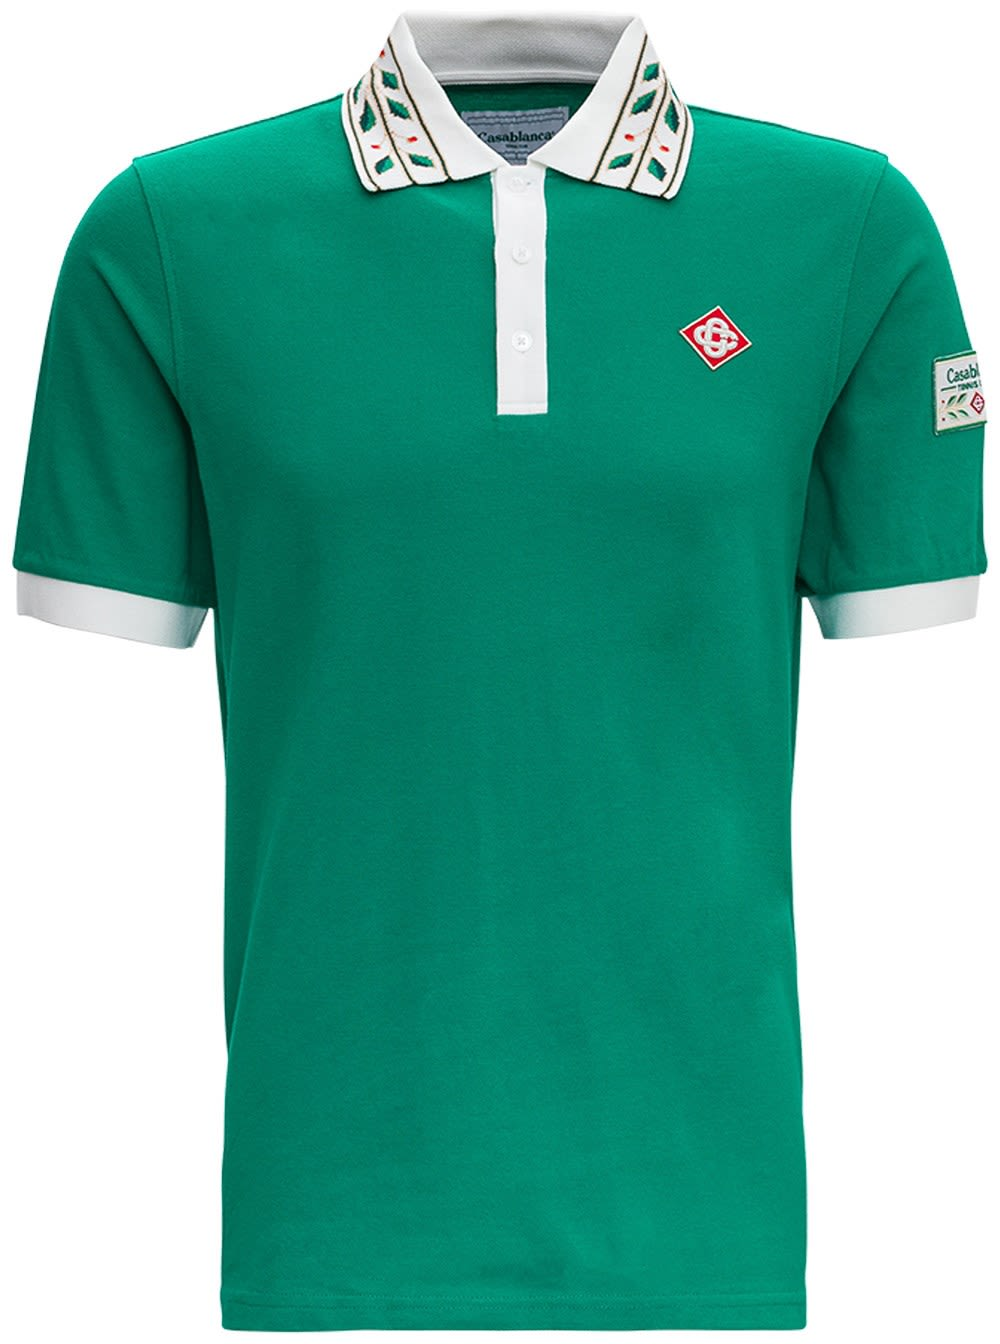 Casablanca Shirts LAUREL CLASSIC POLO SHIRT IN GREEN COTTON